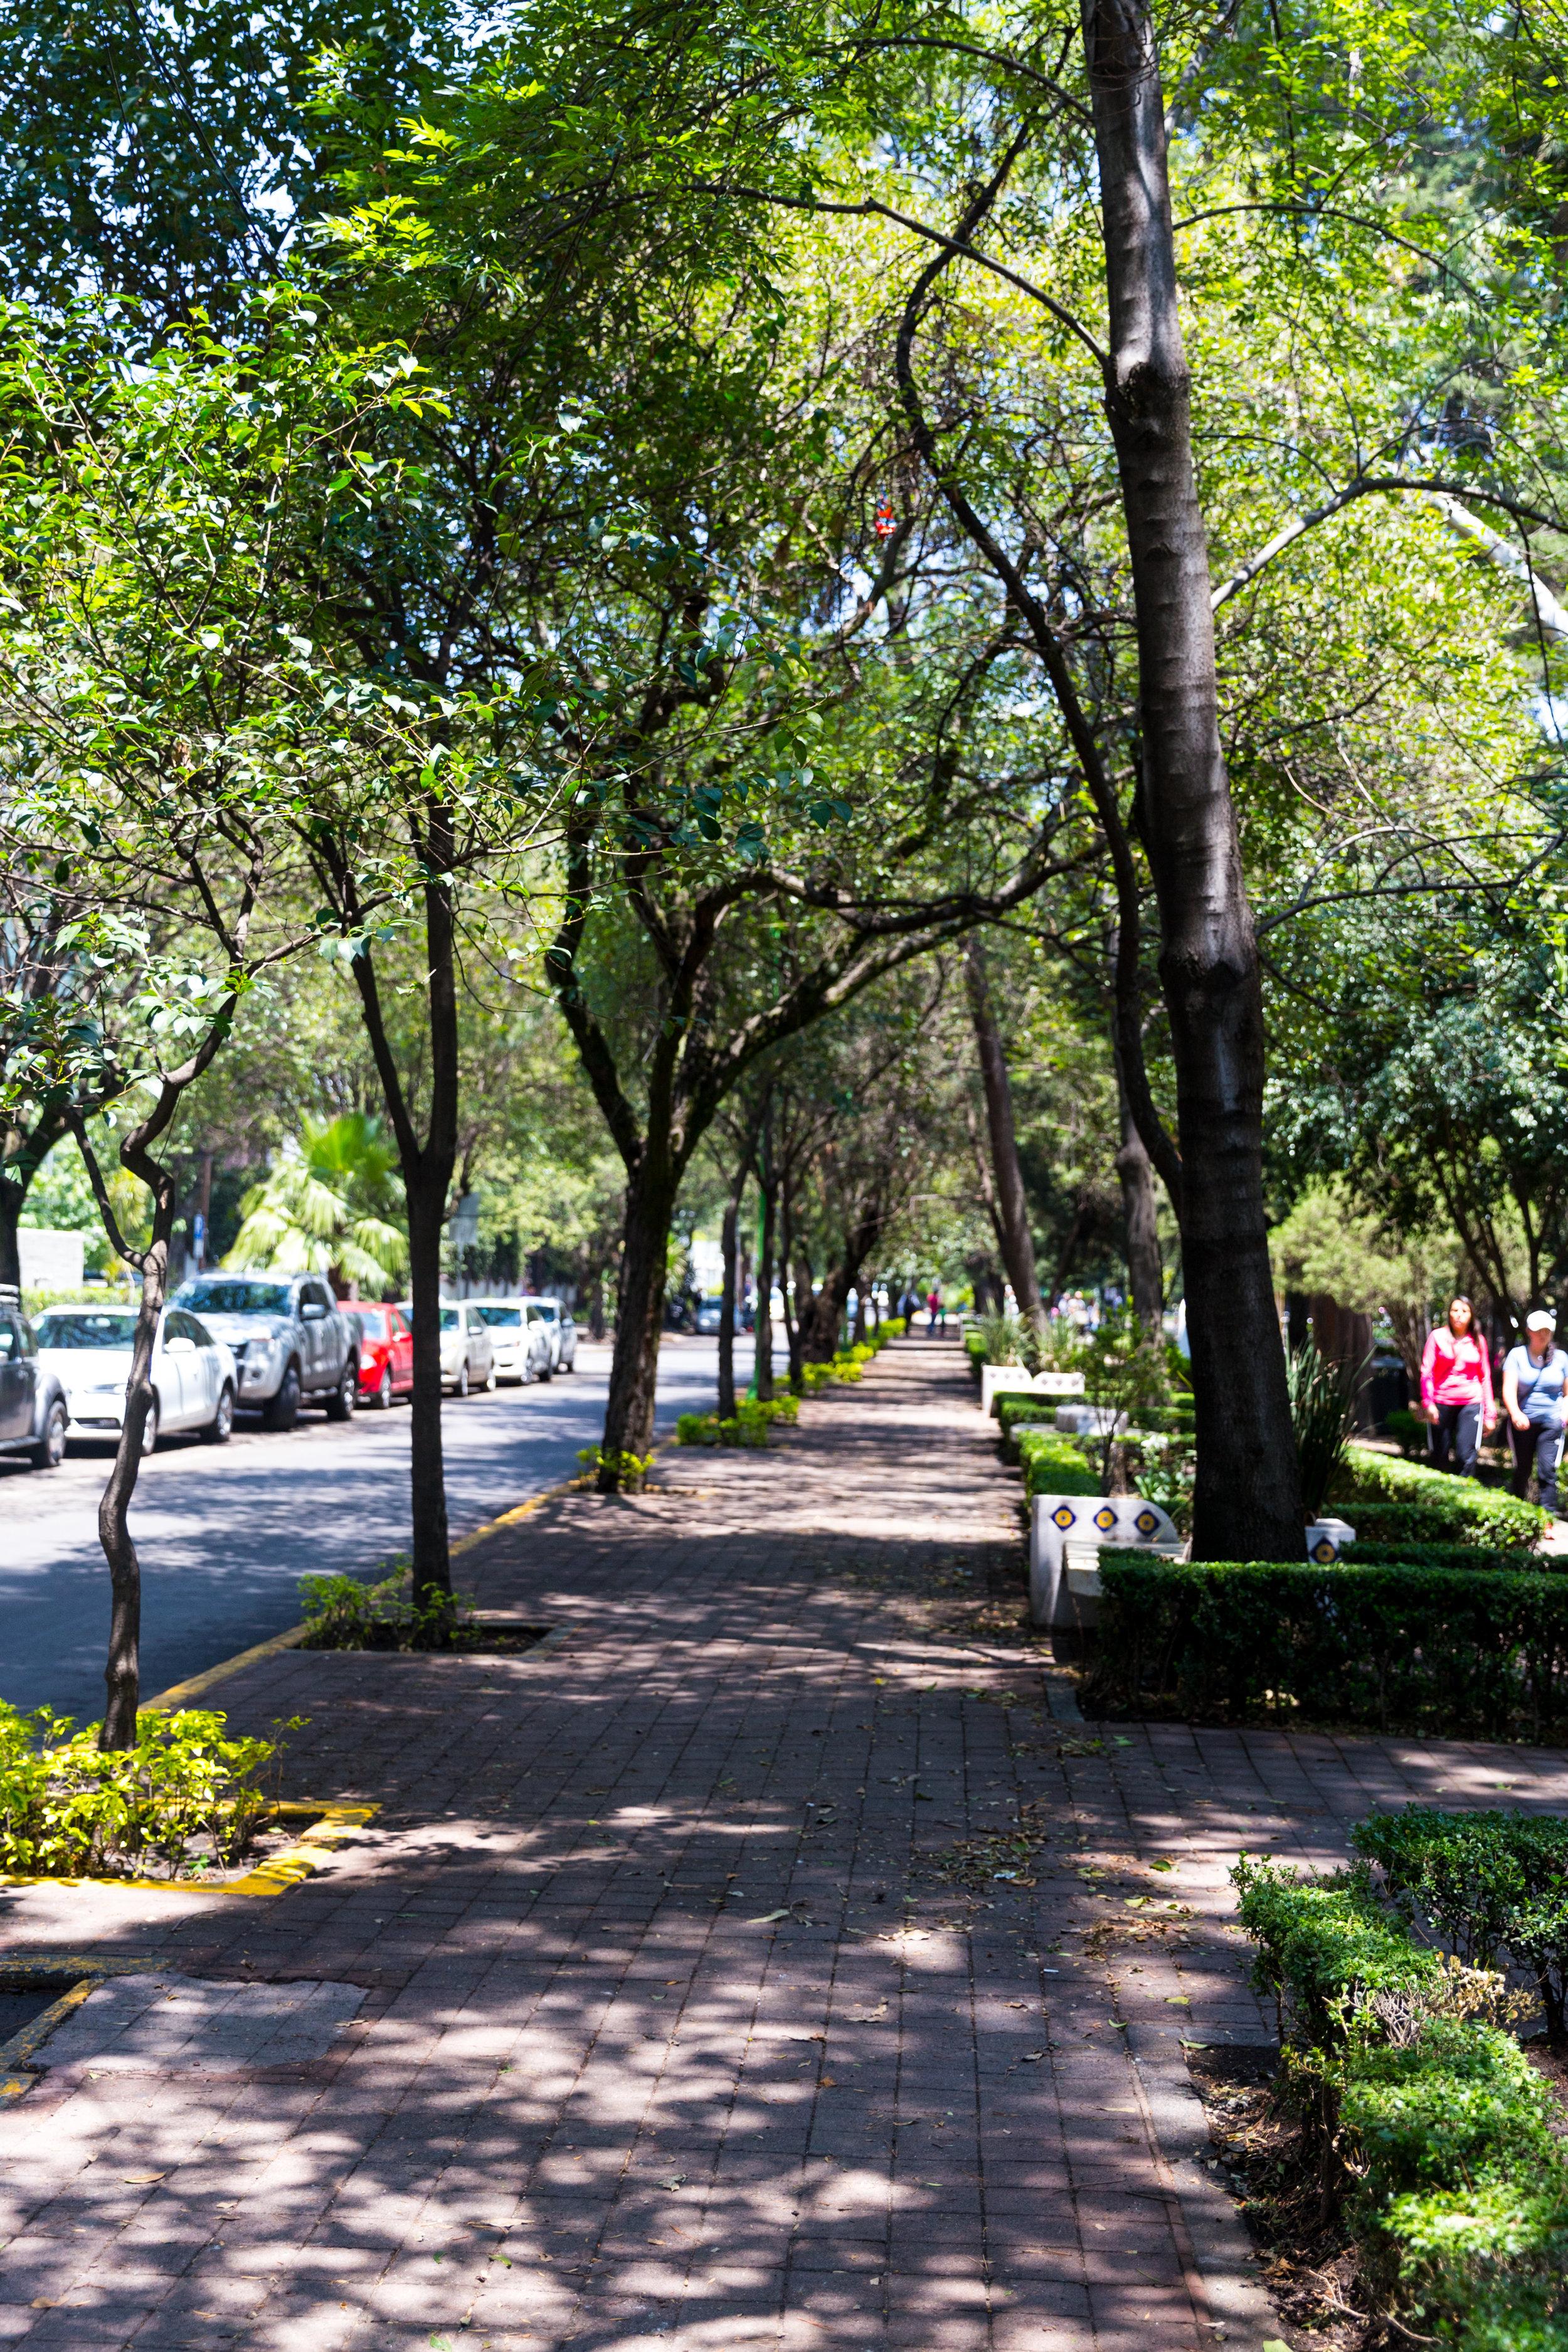 Mexico City Centro Historico-5.jpg